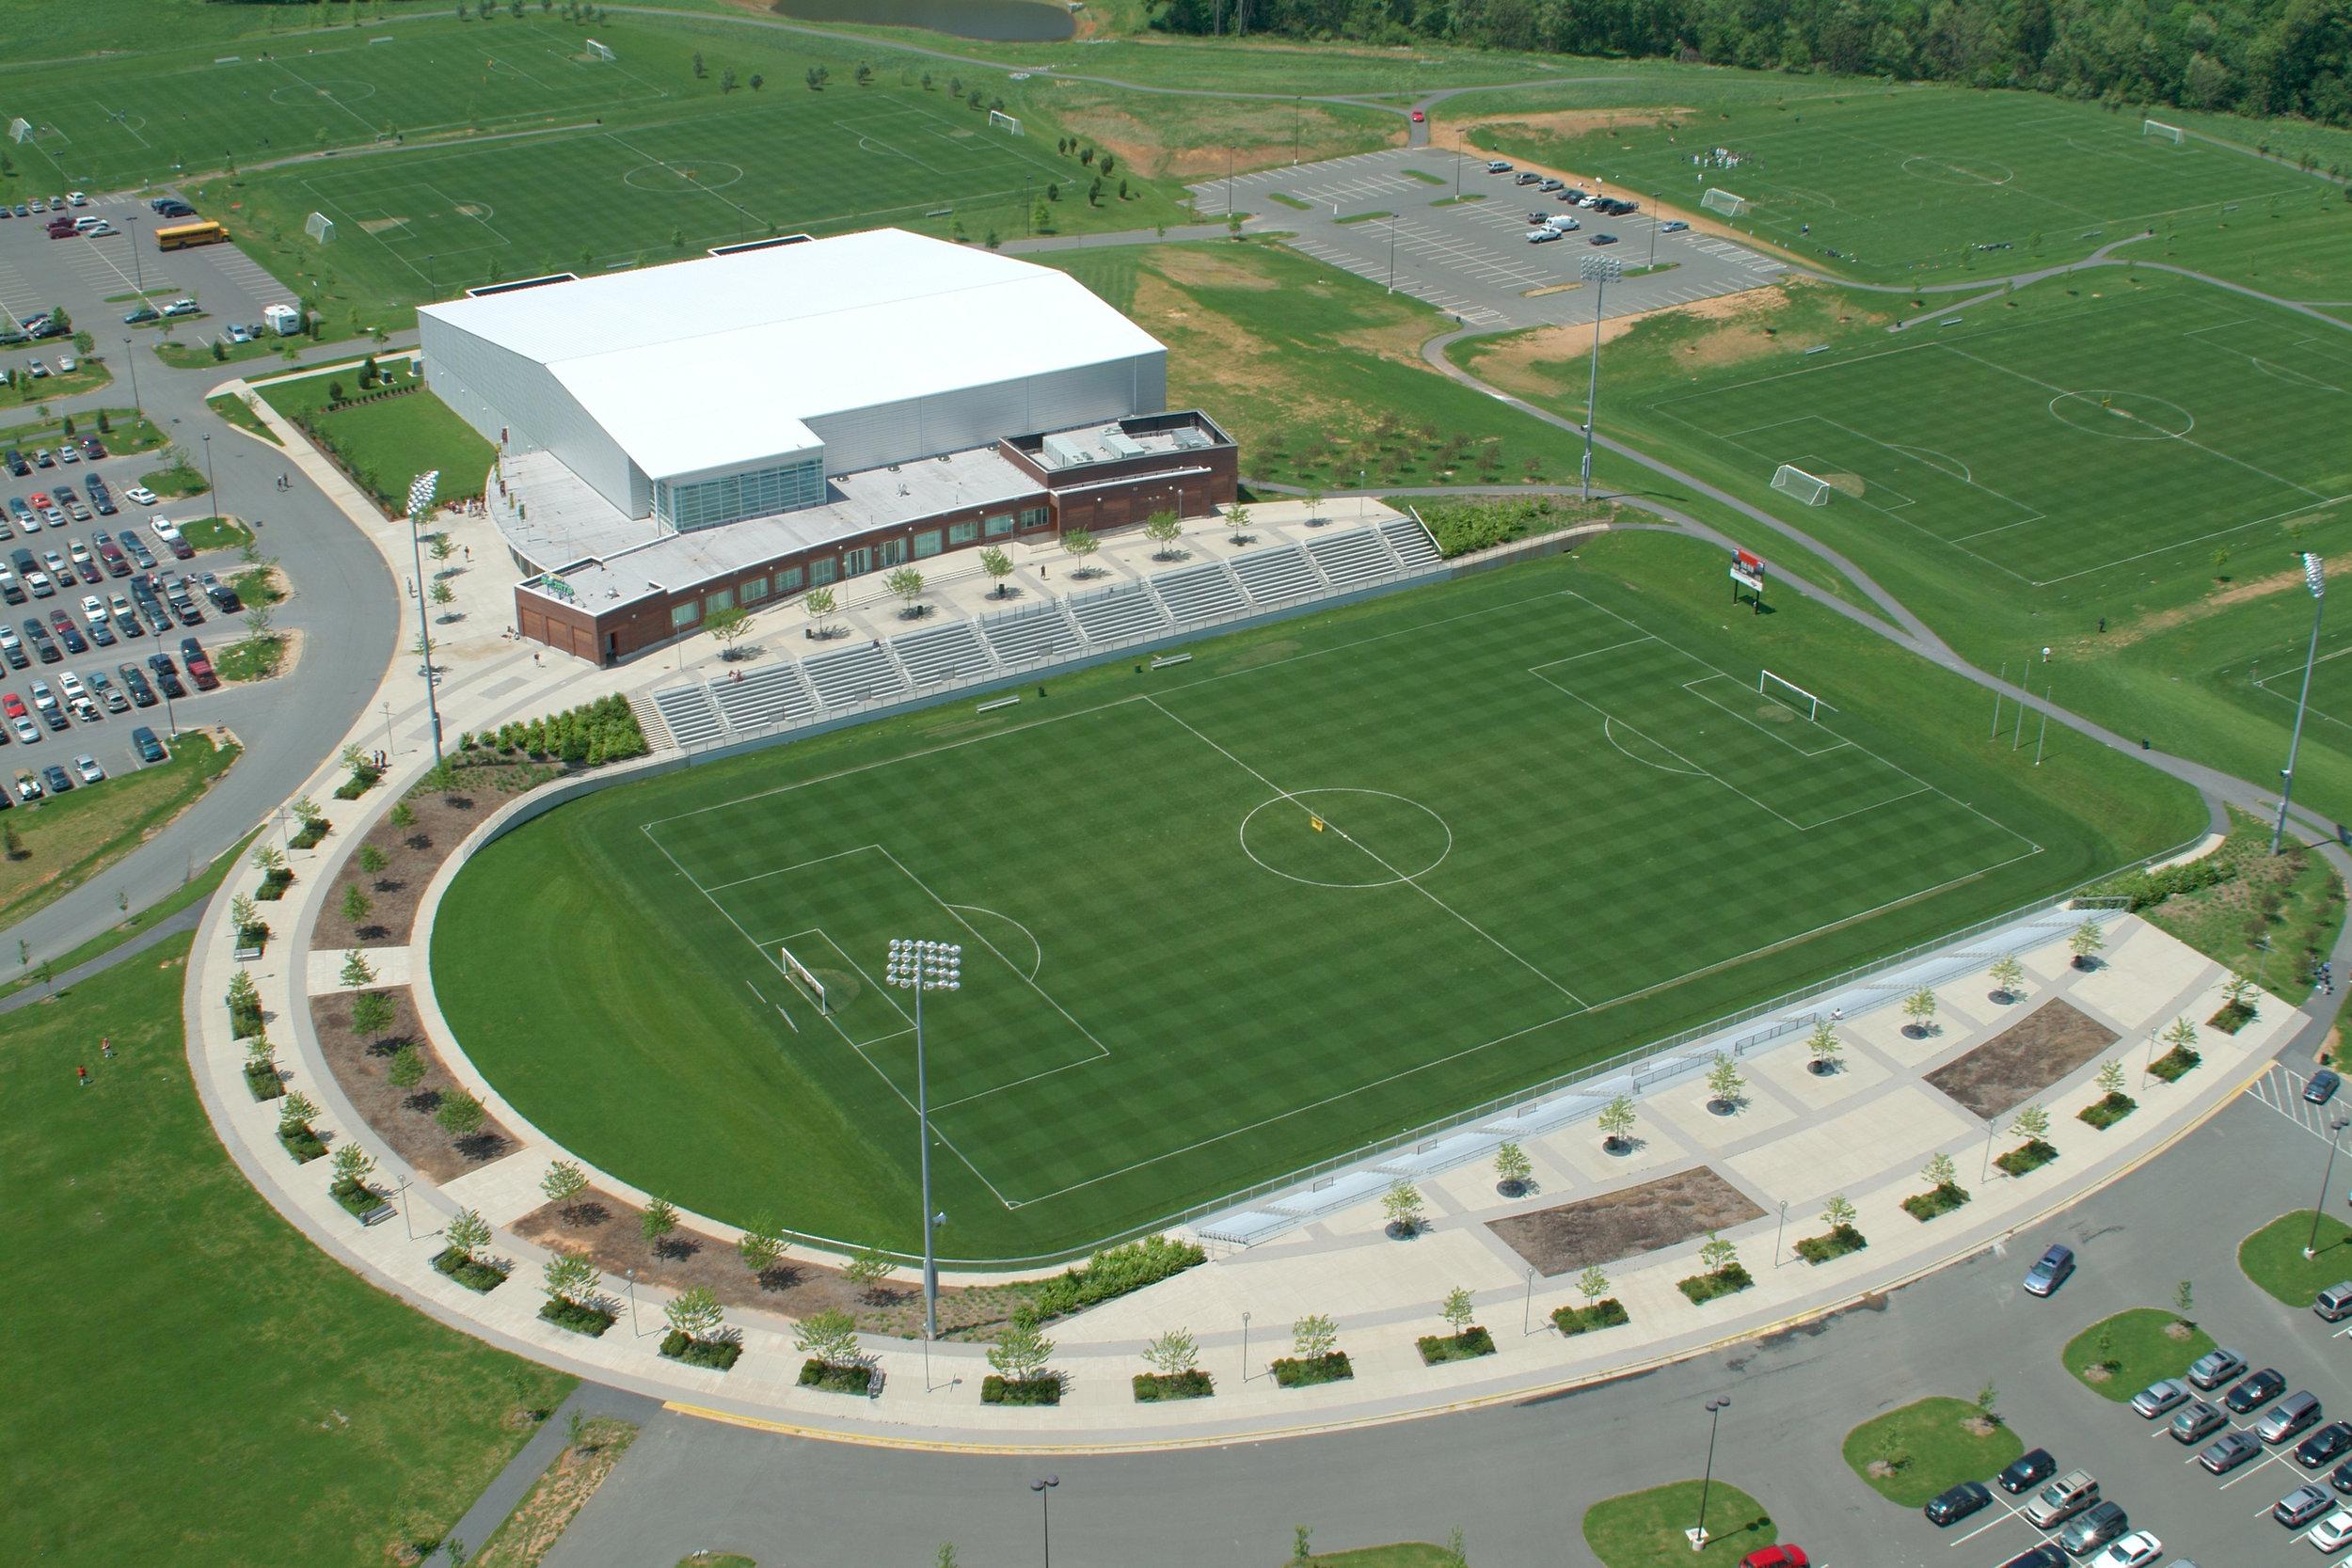 Courtesy of  Maryland SoccerPlex